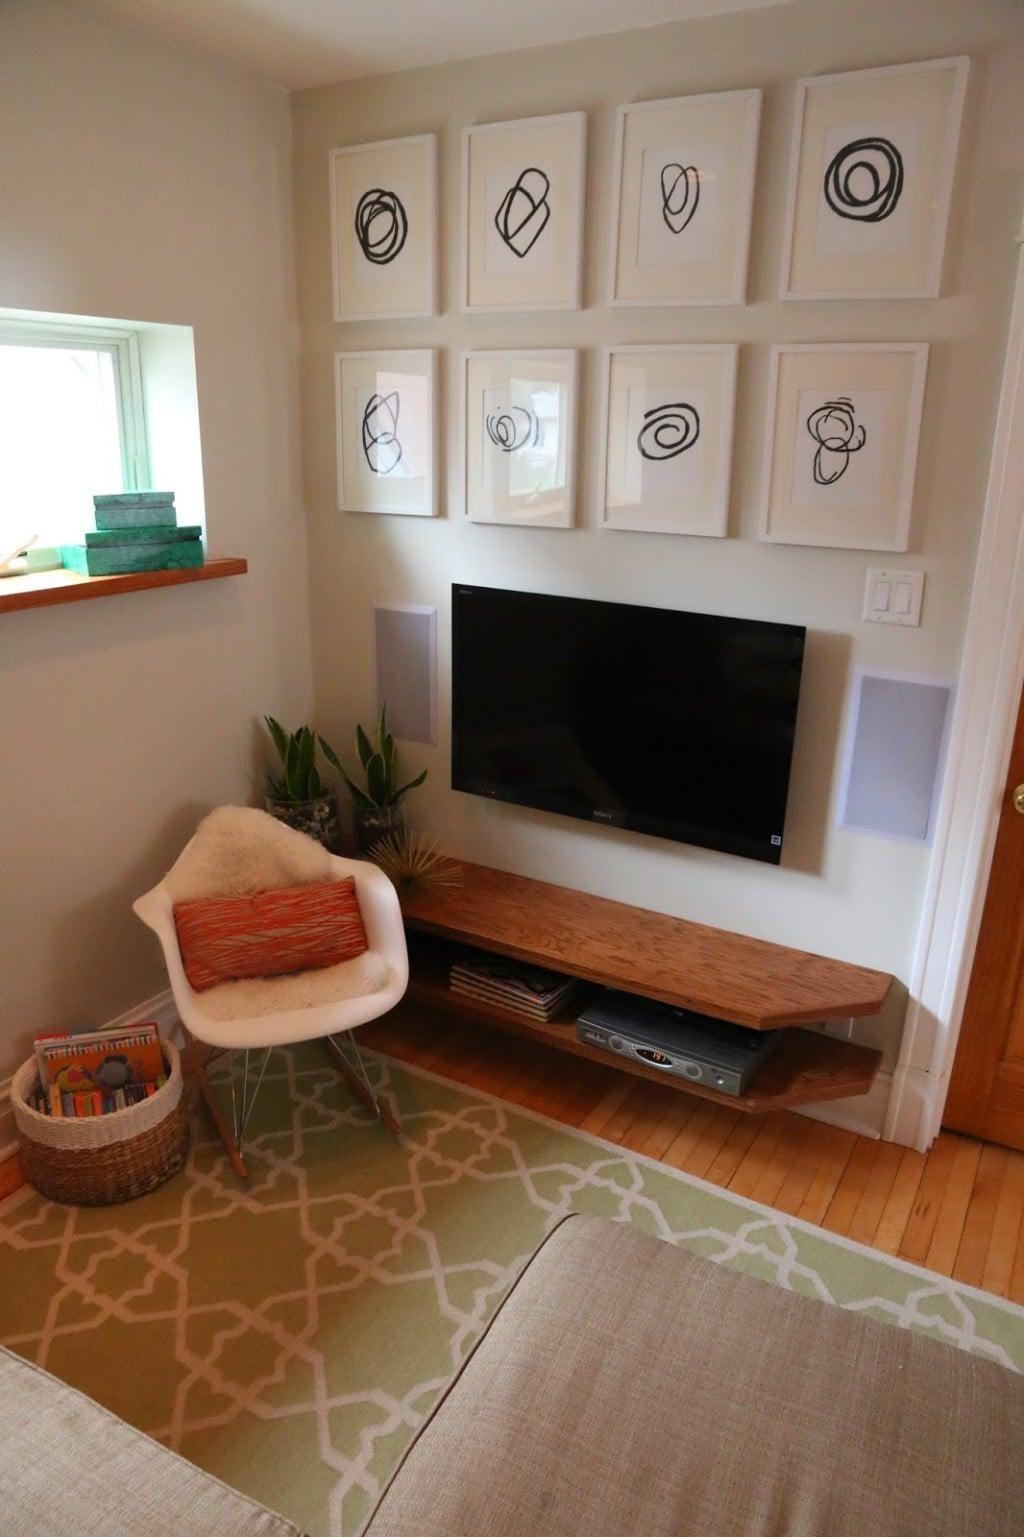 100 ikea living in small space furniture modern living room furniture design with ikea - Small spaces ikea photos ...